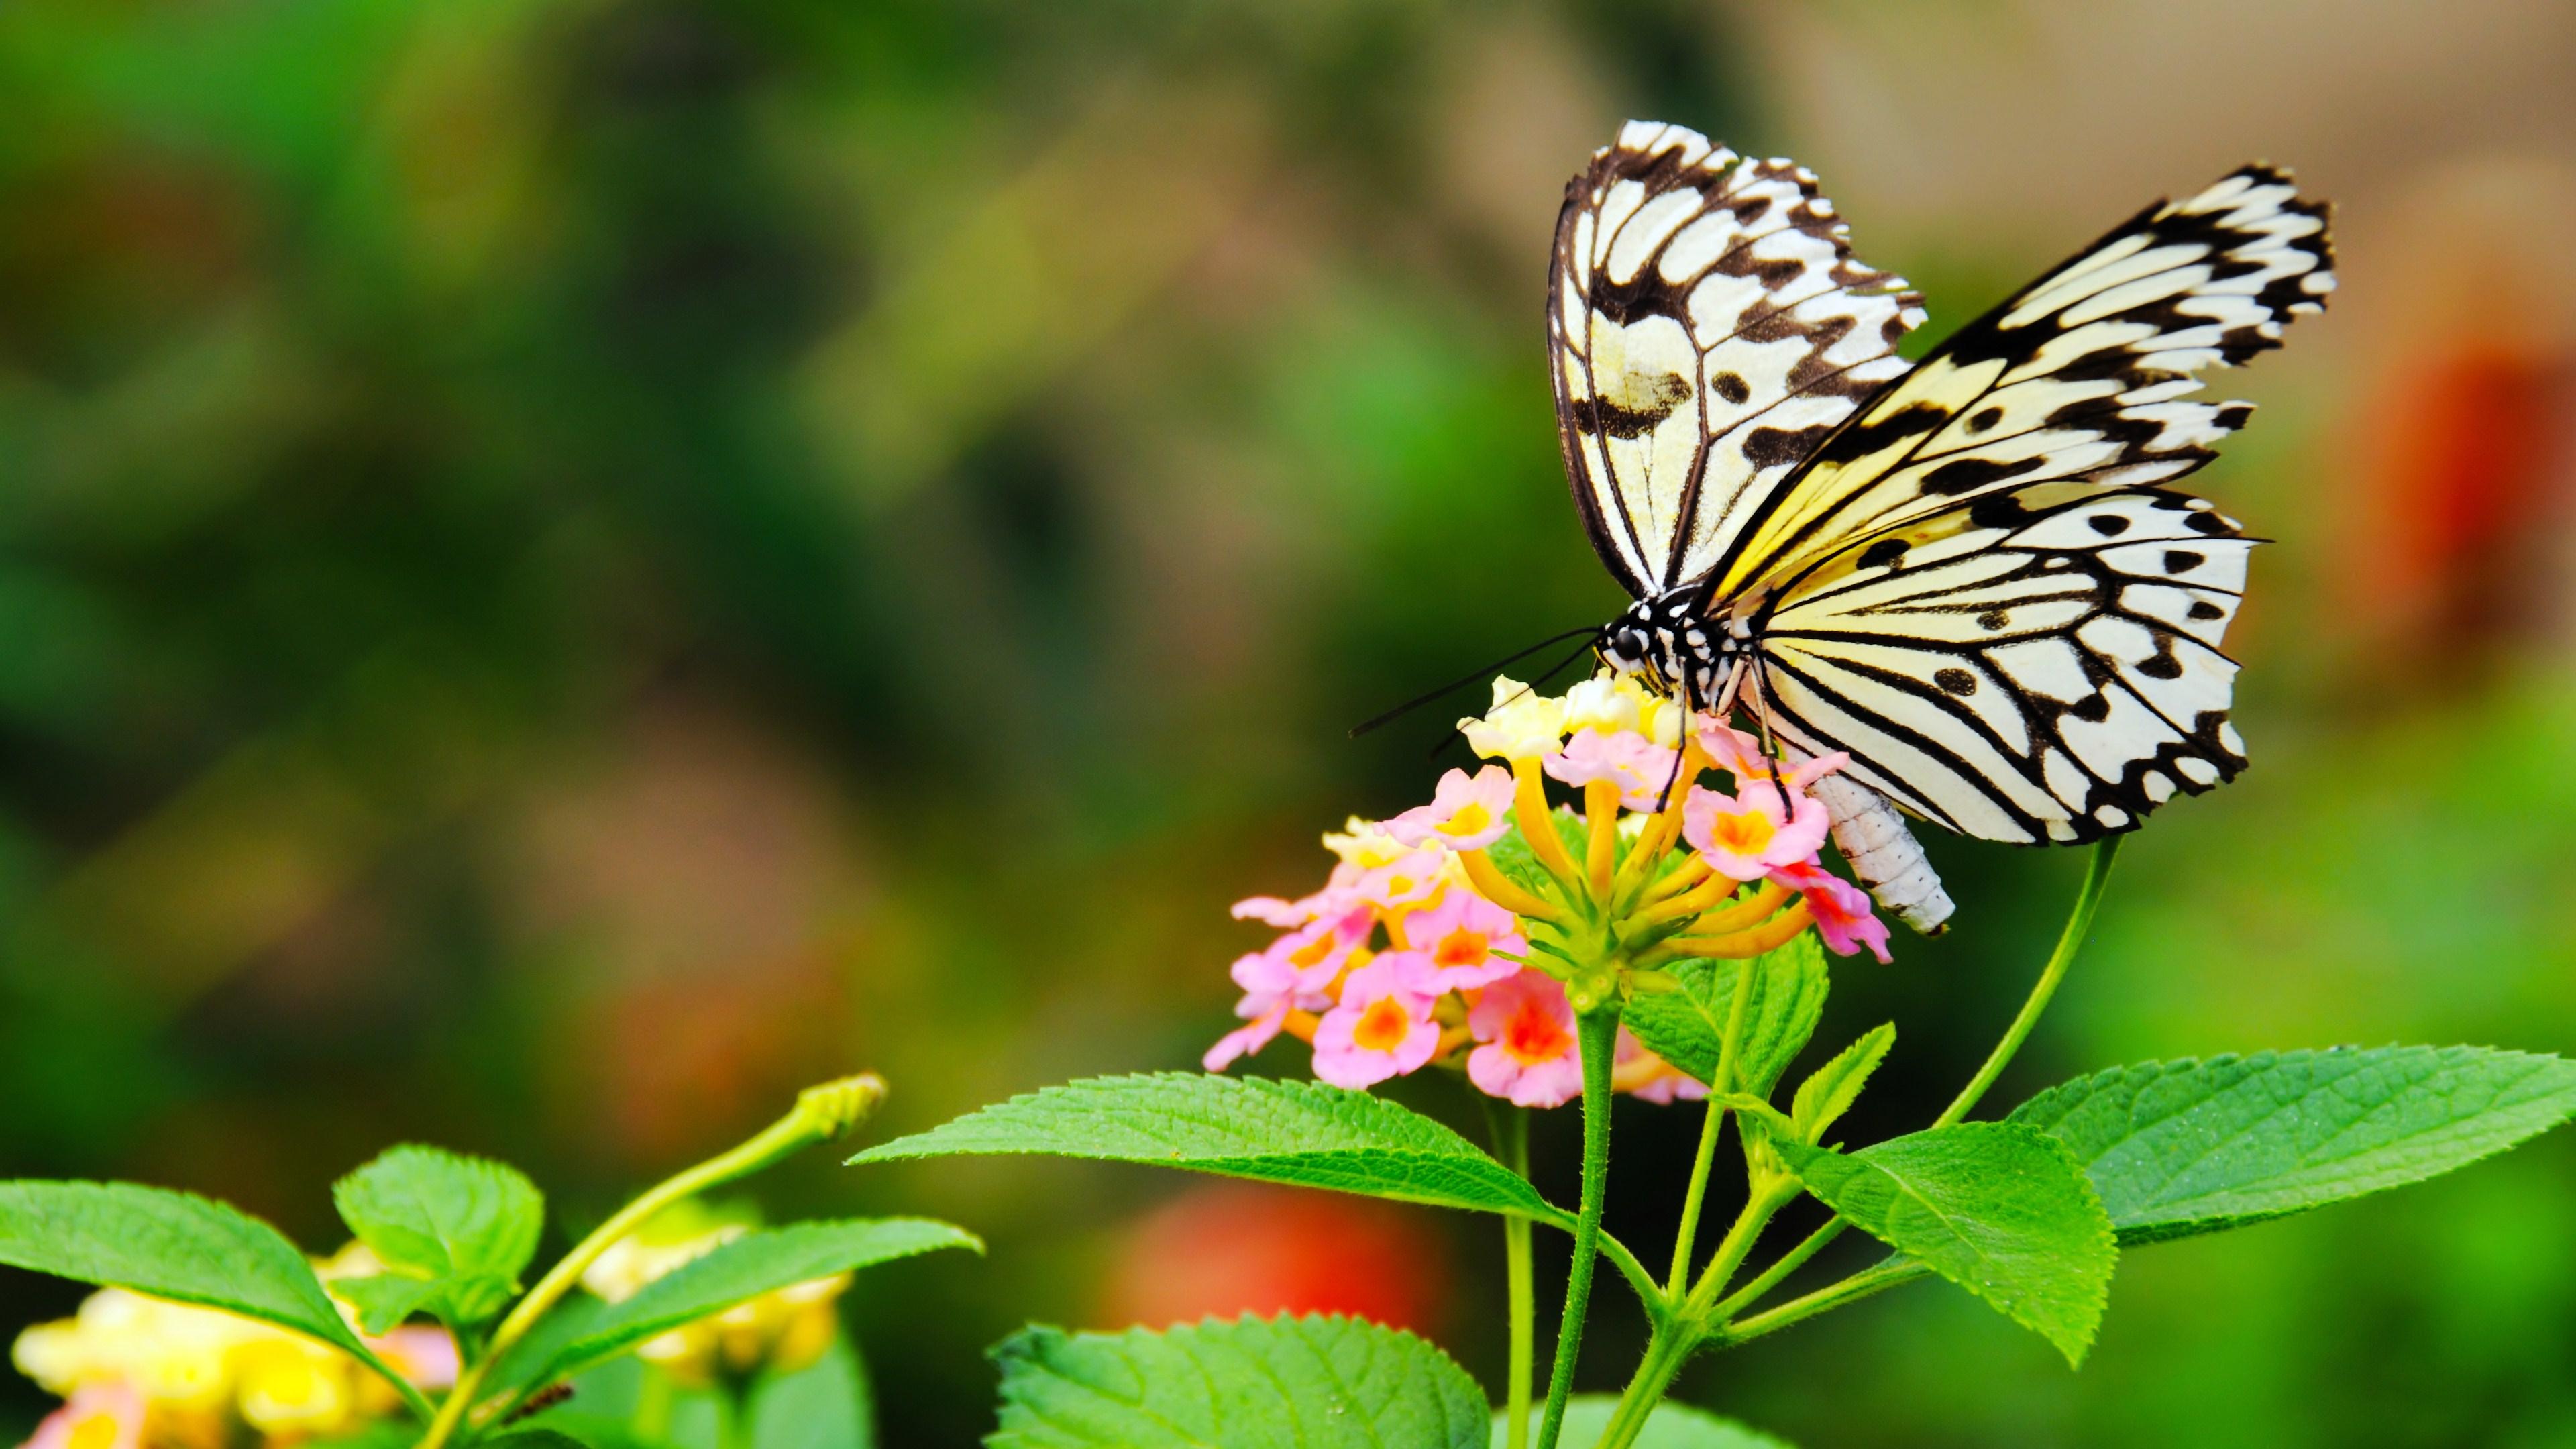 Butterflies 4k ultra hd wallpaper background image 3840x2160 id 467026 wallpaper abyss - Ultra 4k background images ...